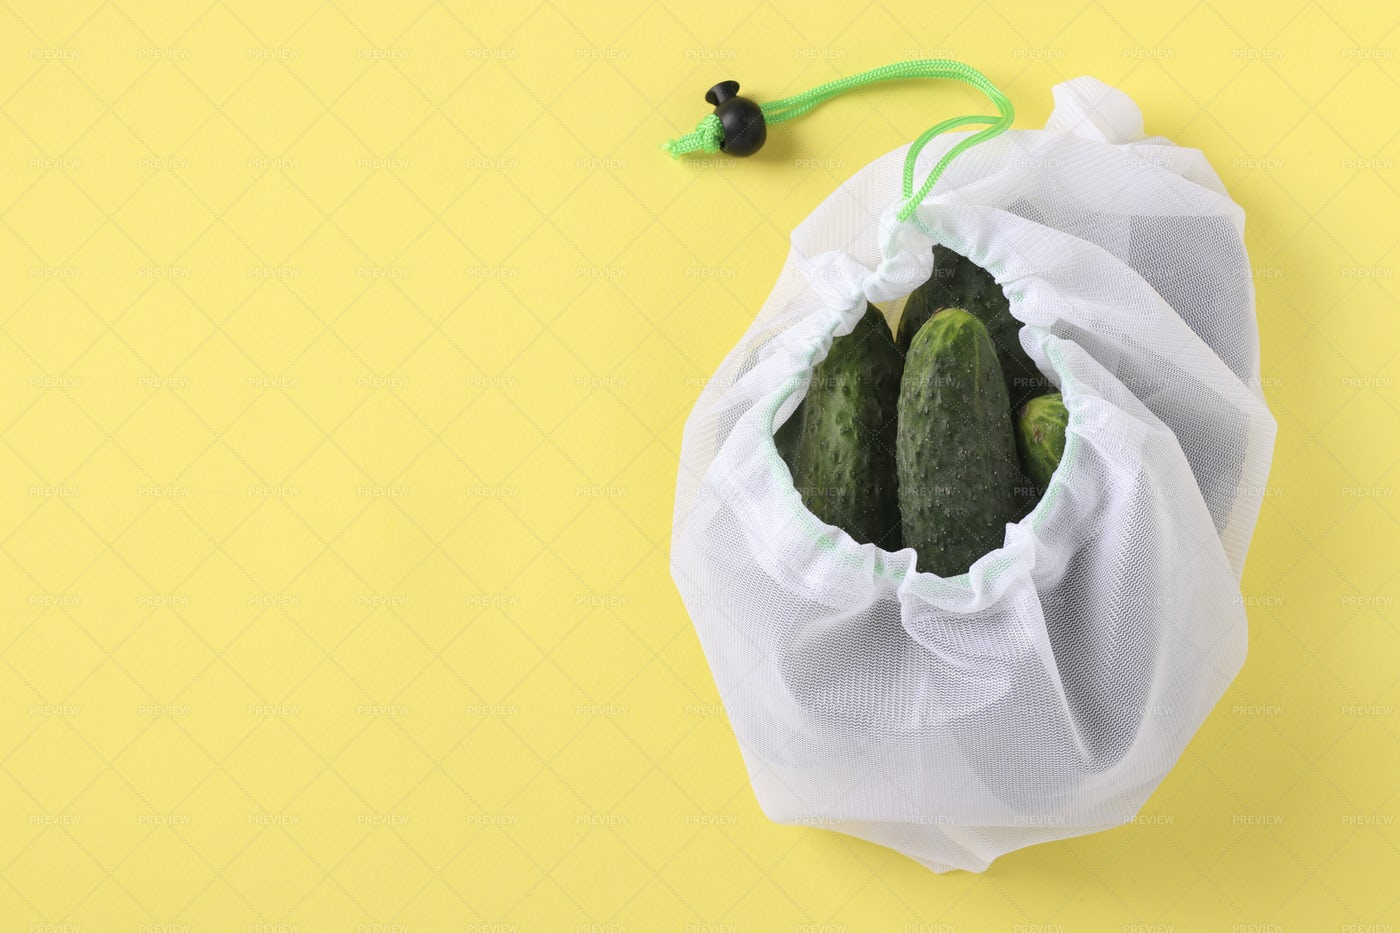 Cucumbers In An Eco Bag: Stock Photos